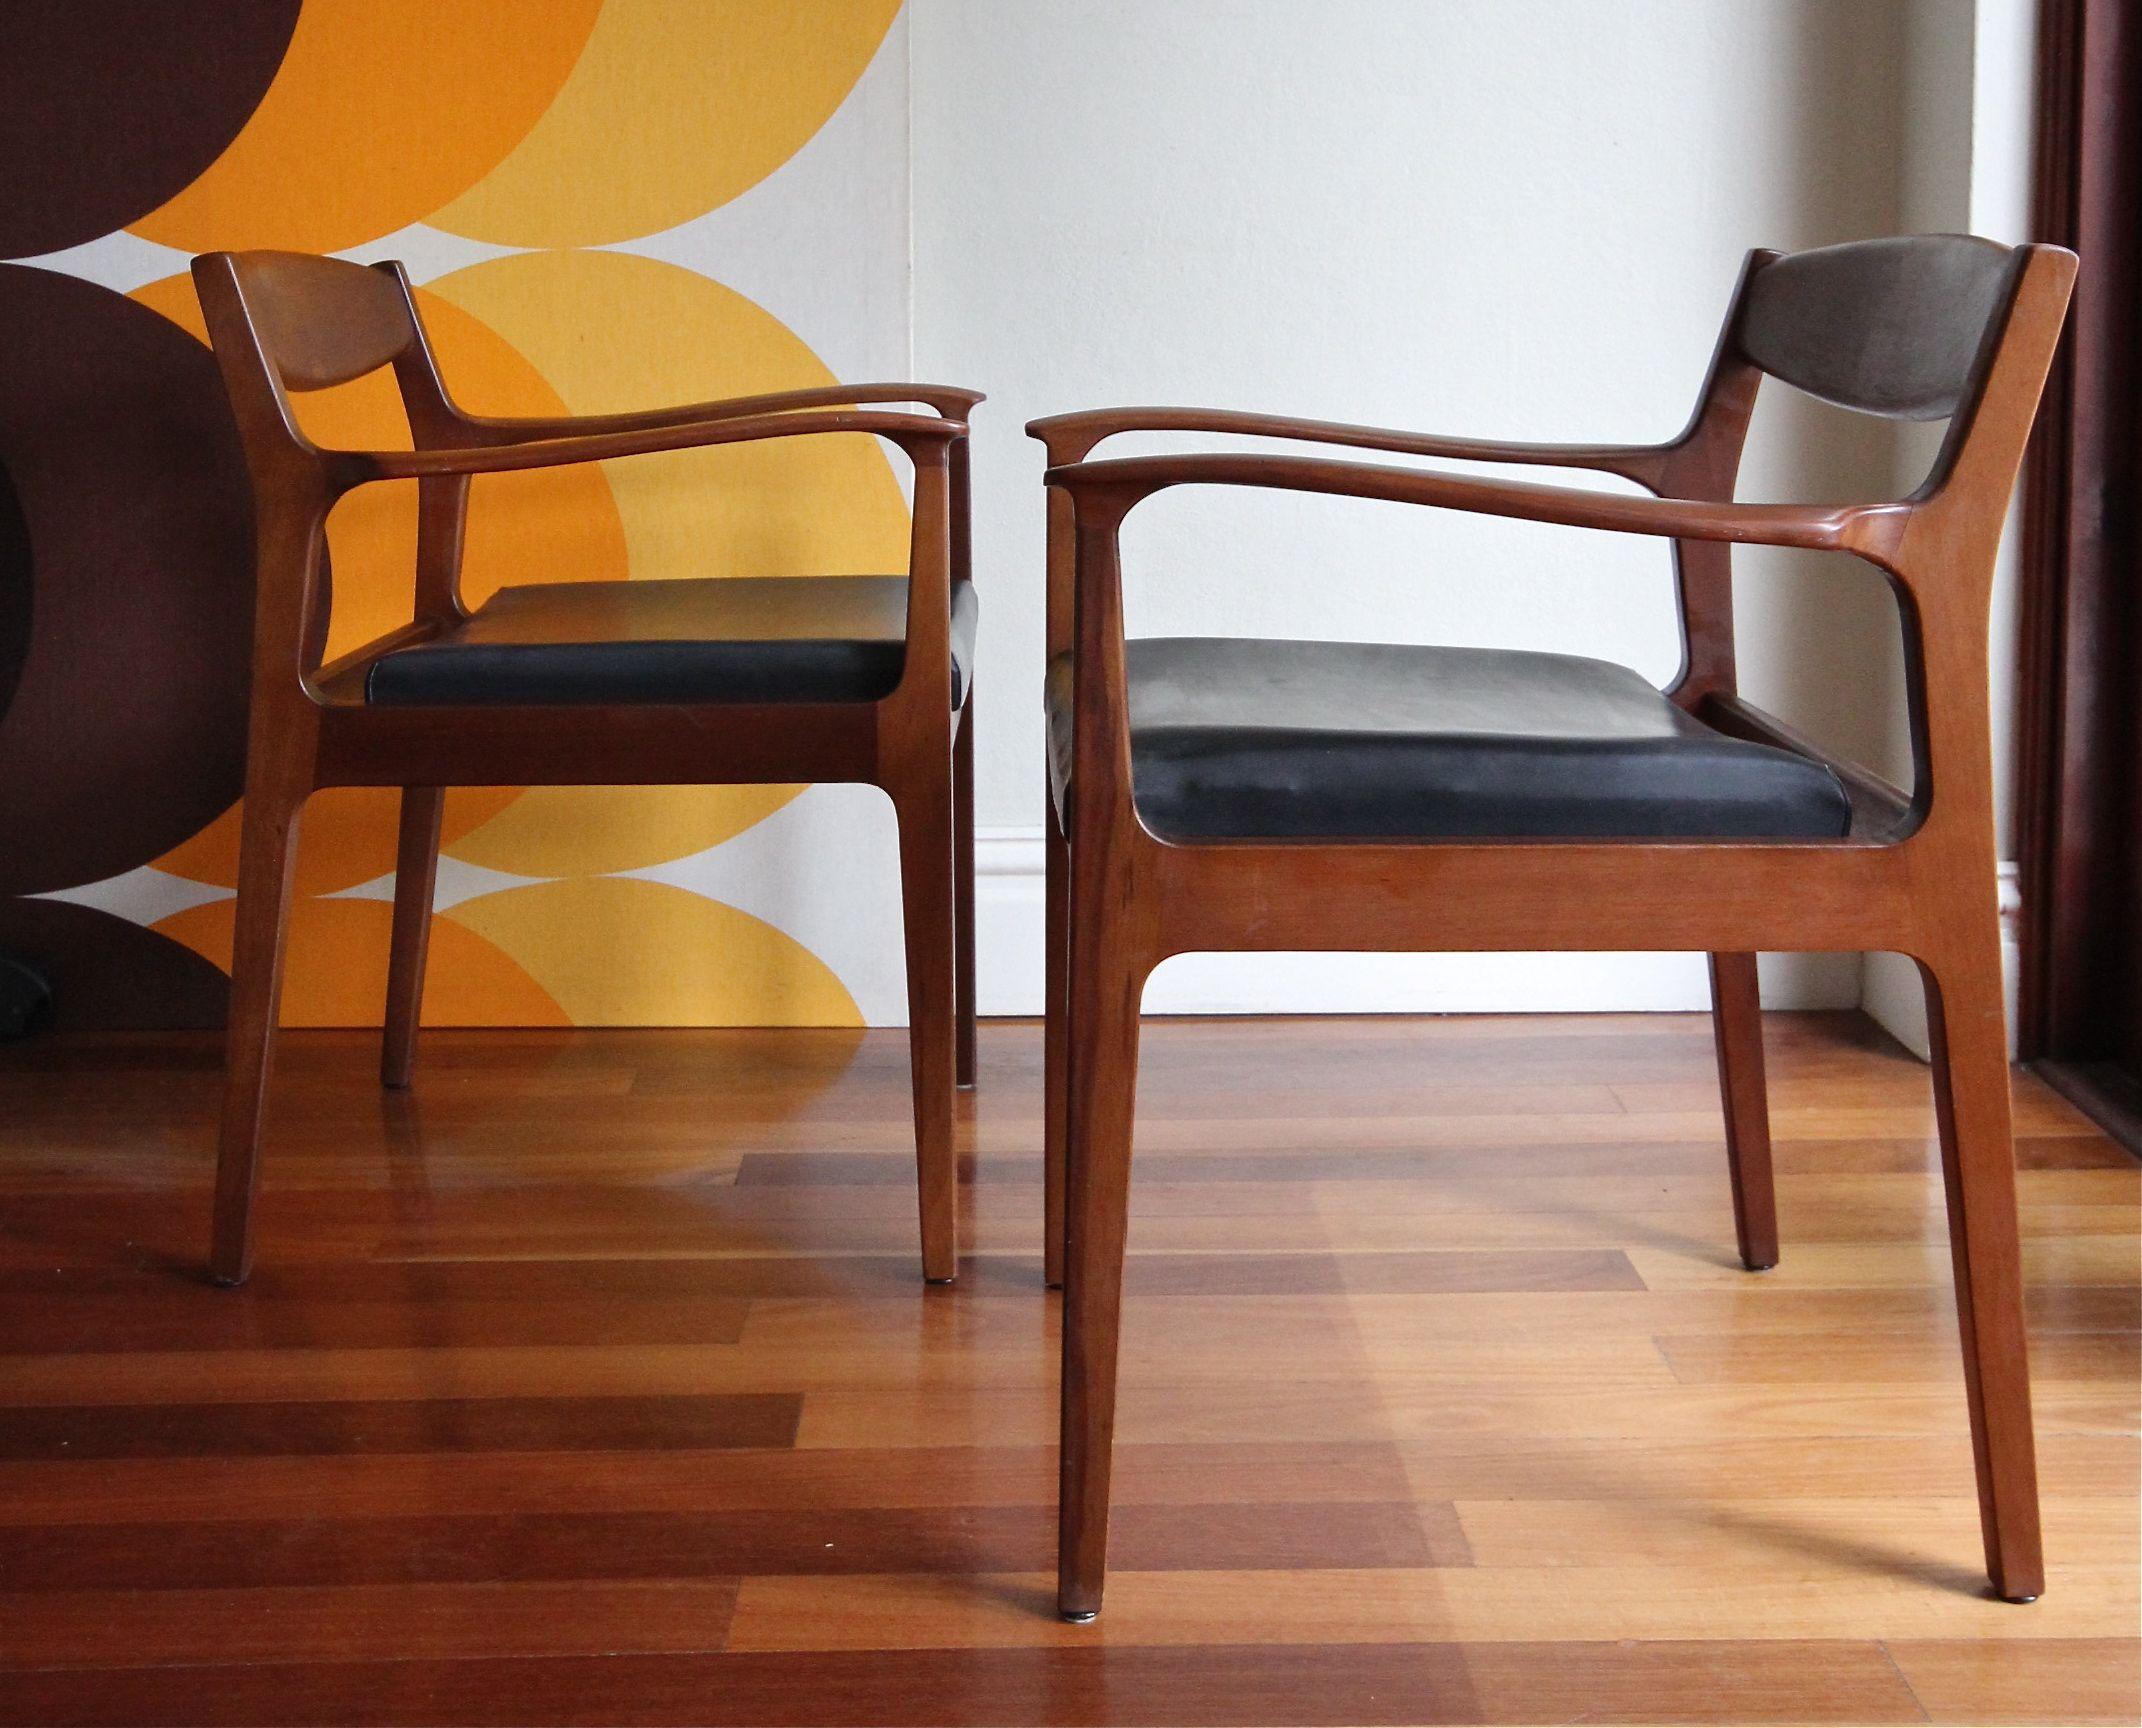 wrightbilt arm chairs